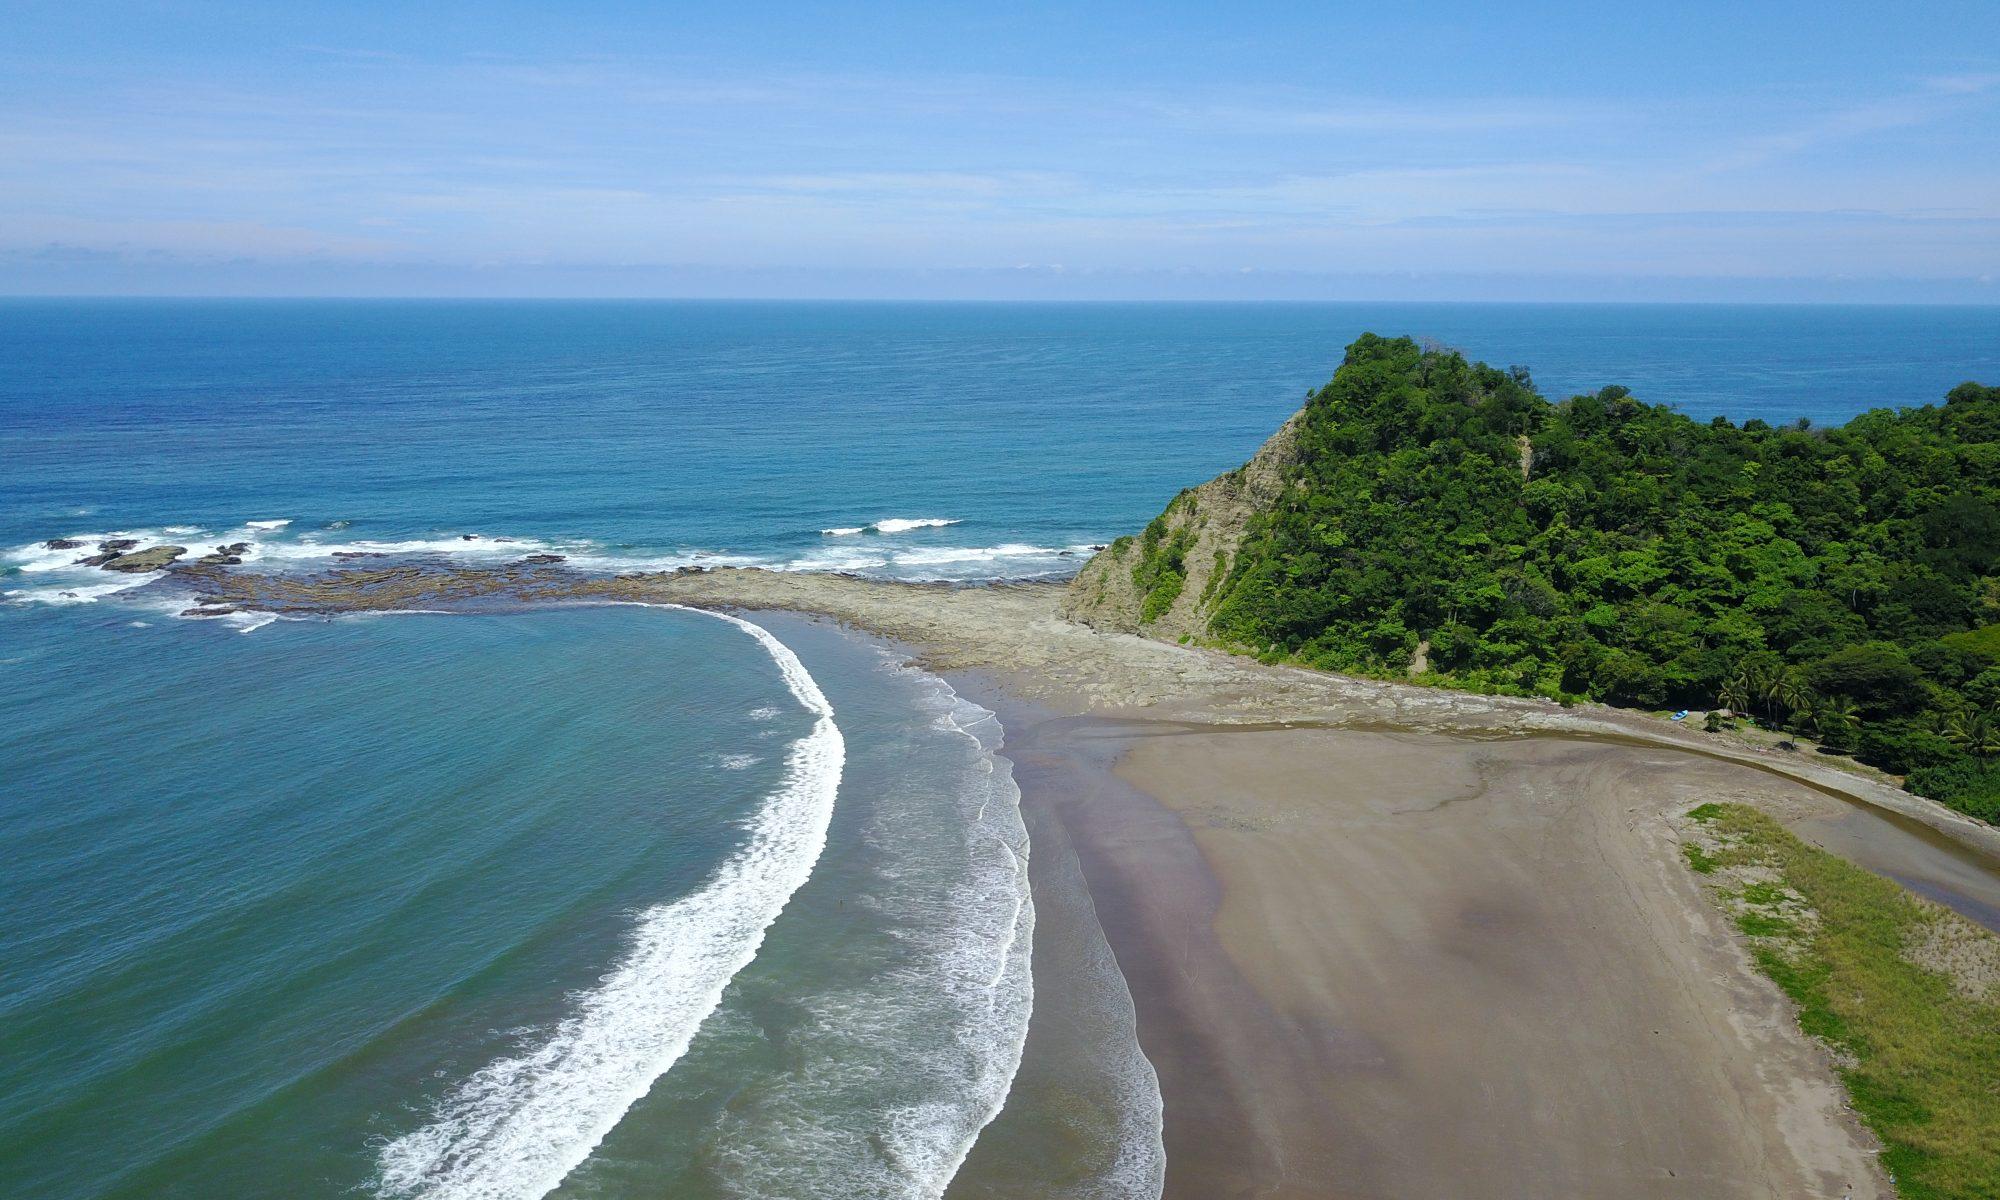 Costa Rica Vacation on a sunny day at the beach Buena Vista Costa Rica